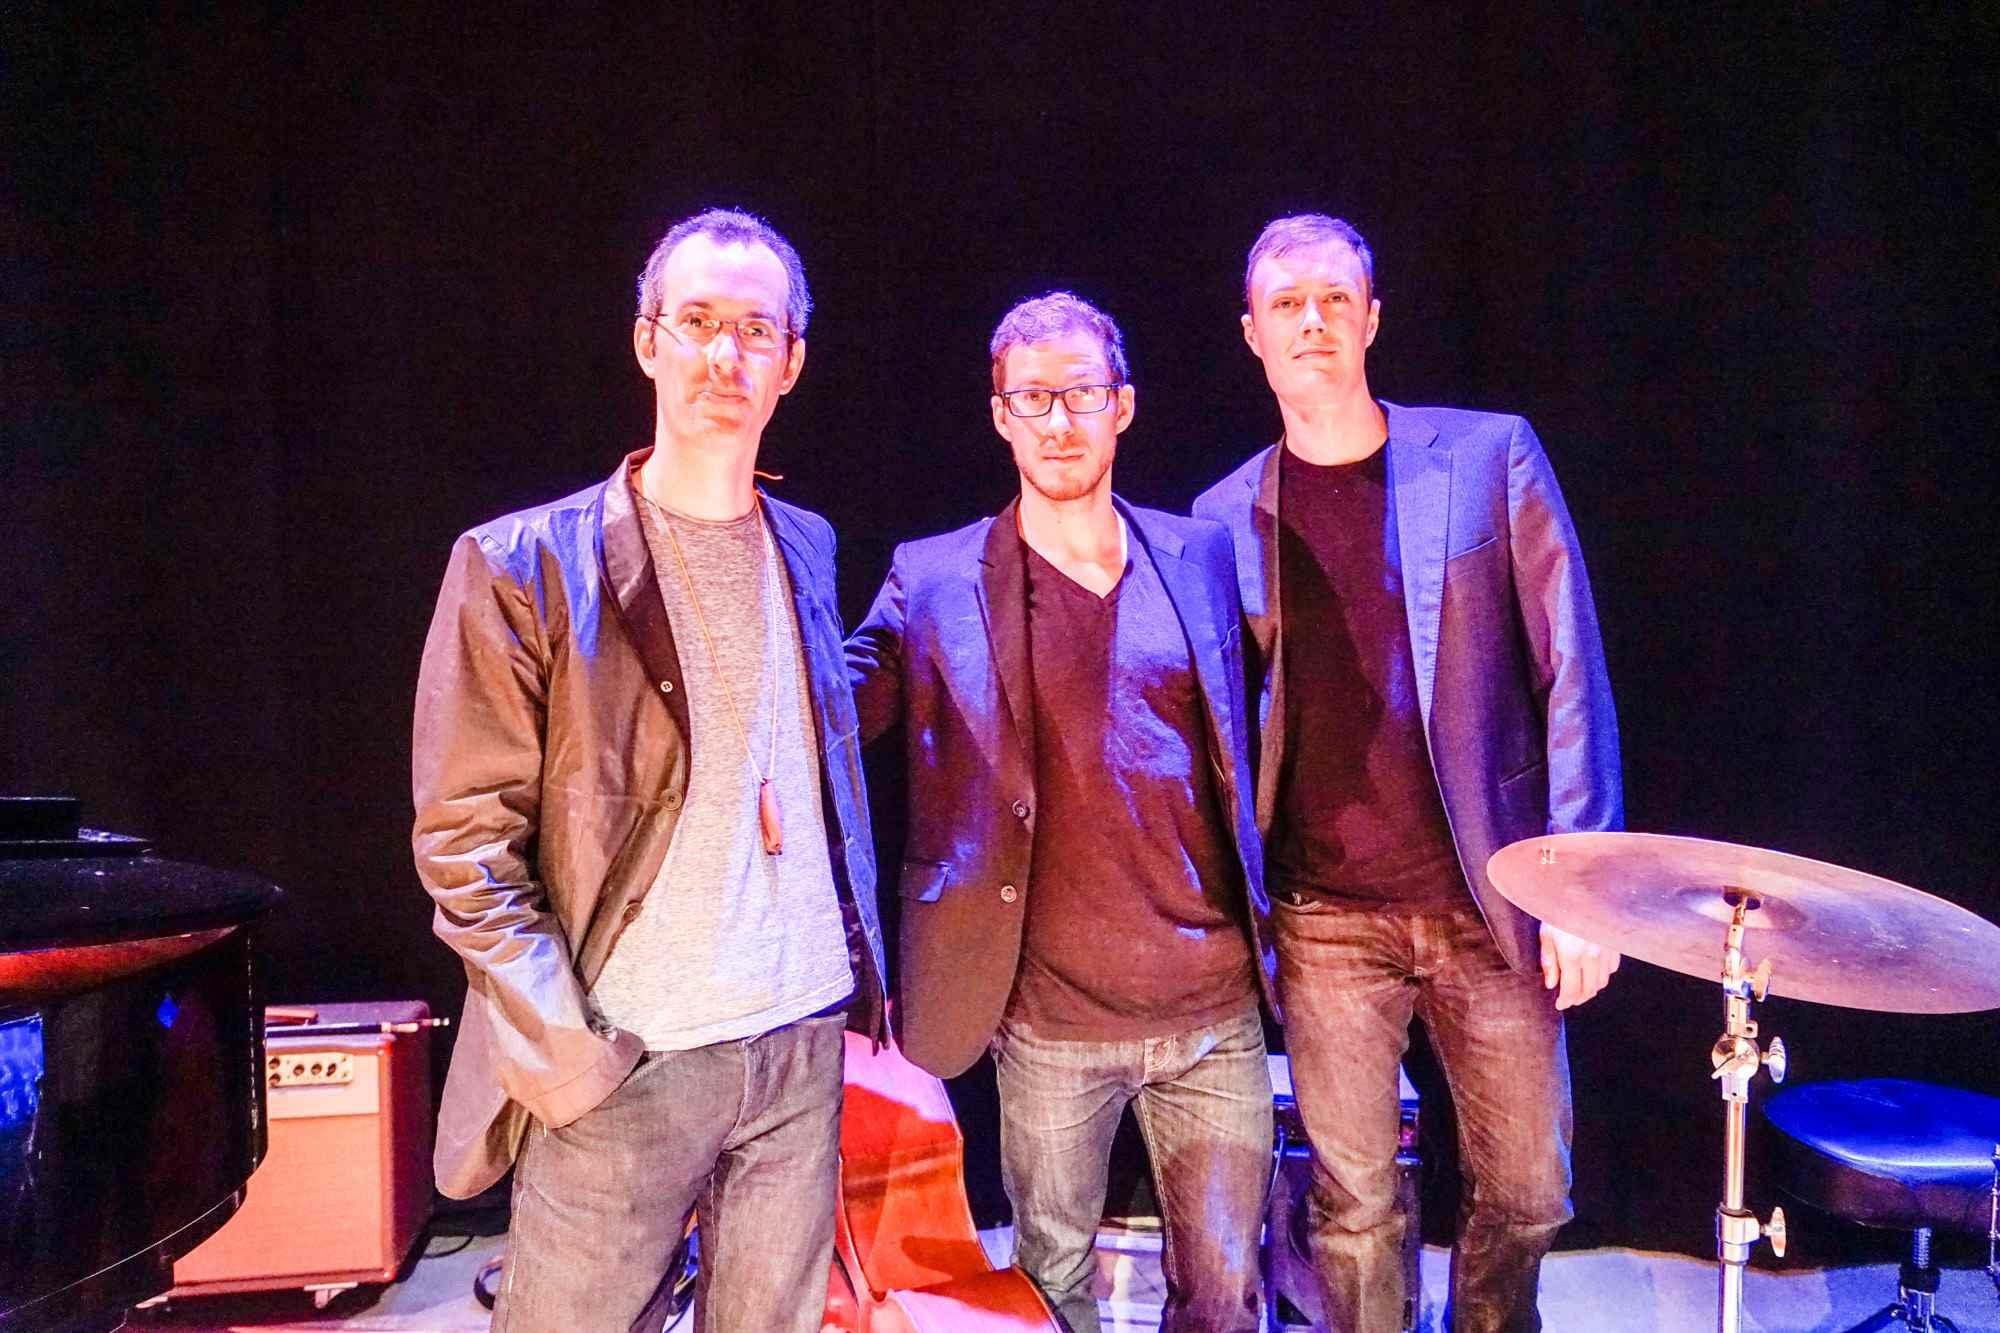 Left-right: Adam Seelig (piano), Tyler Emond (bass) & Jeff Halischuk (drums). Photo: Yuri Dojc.